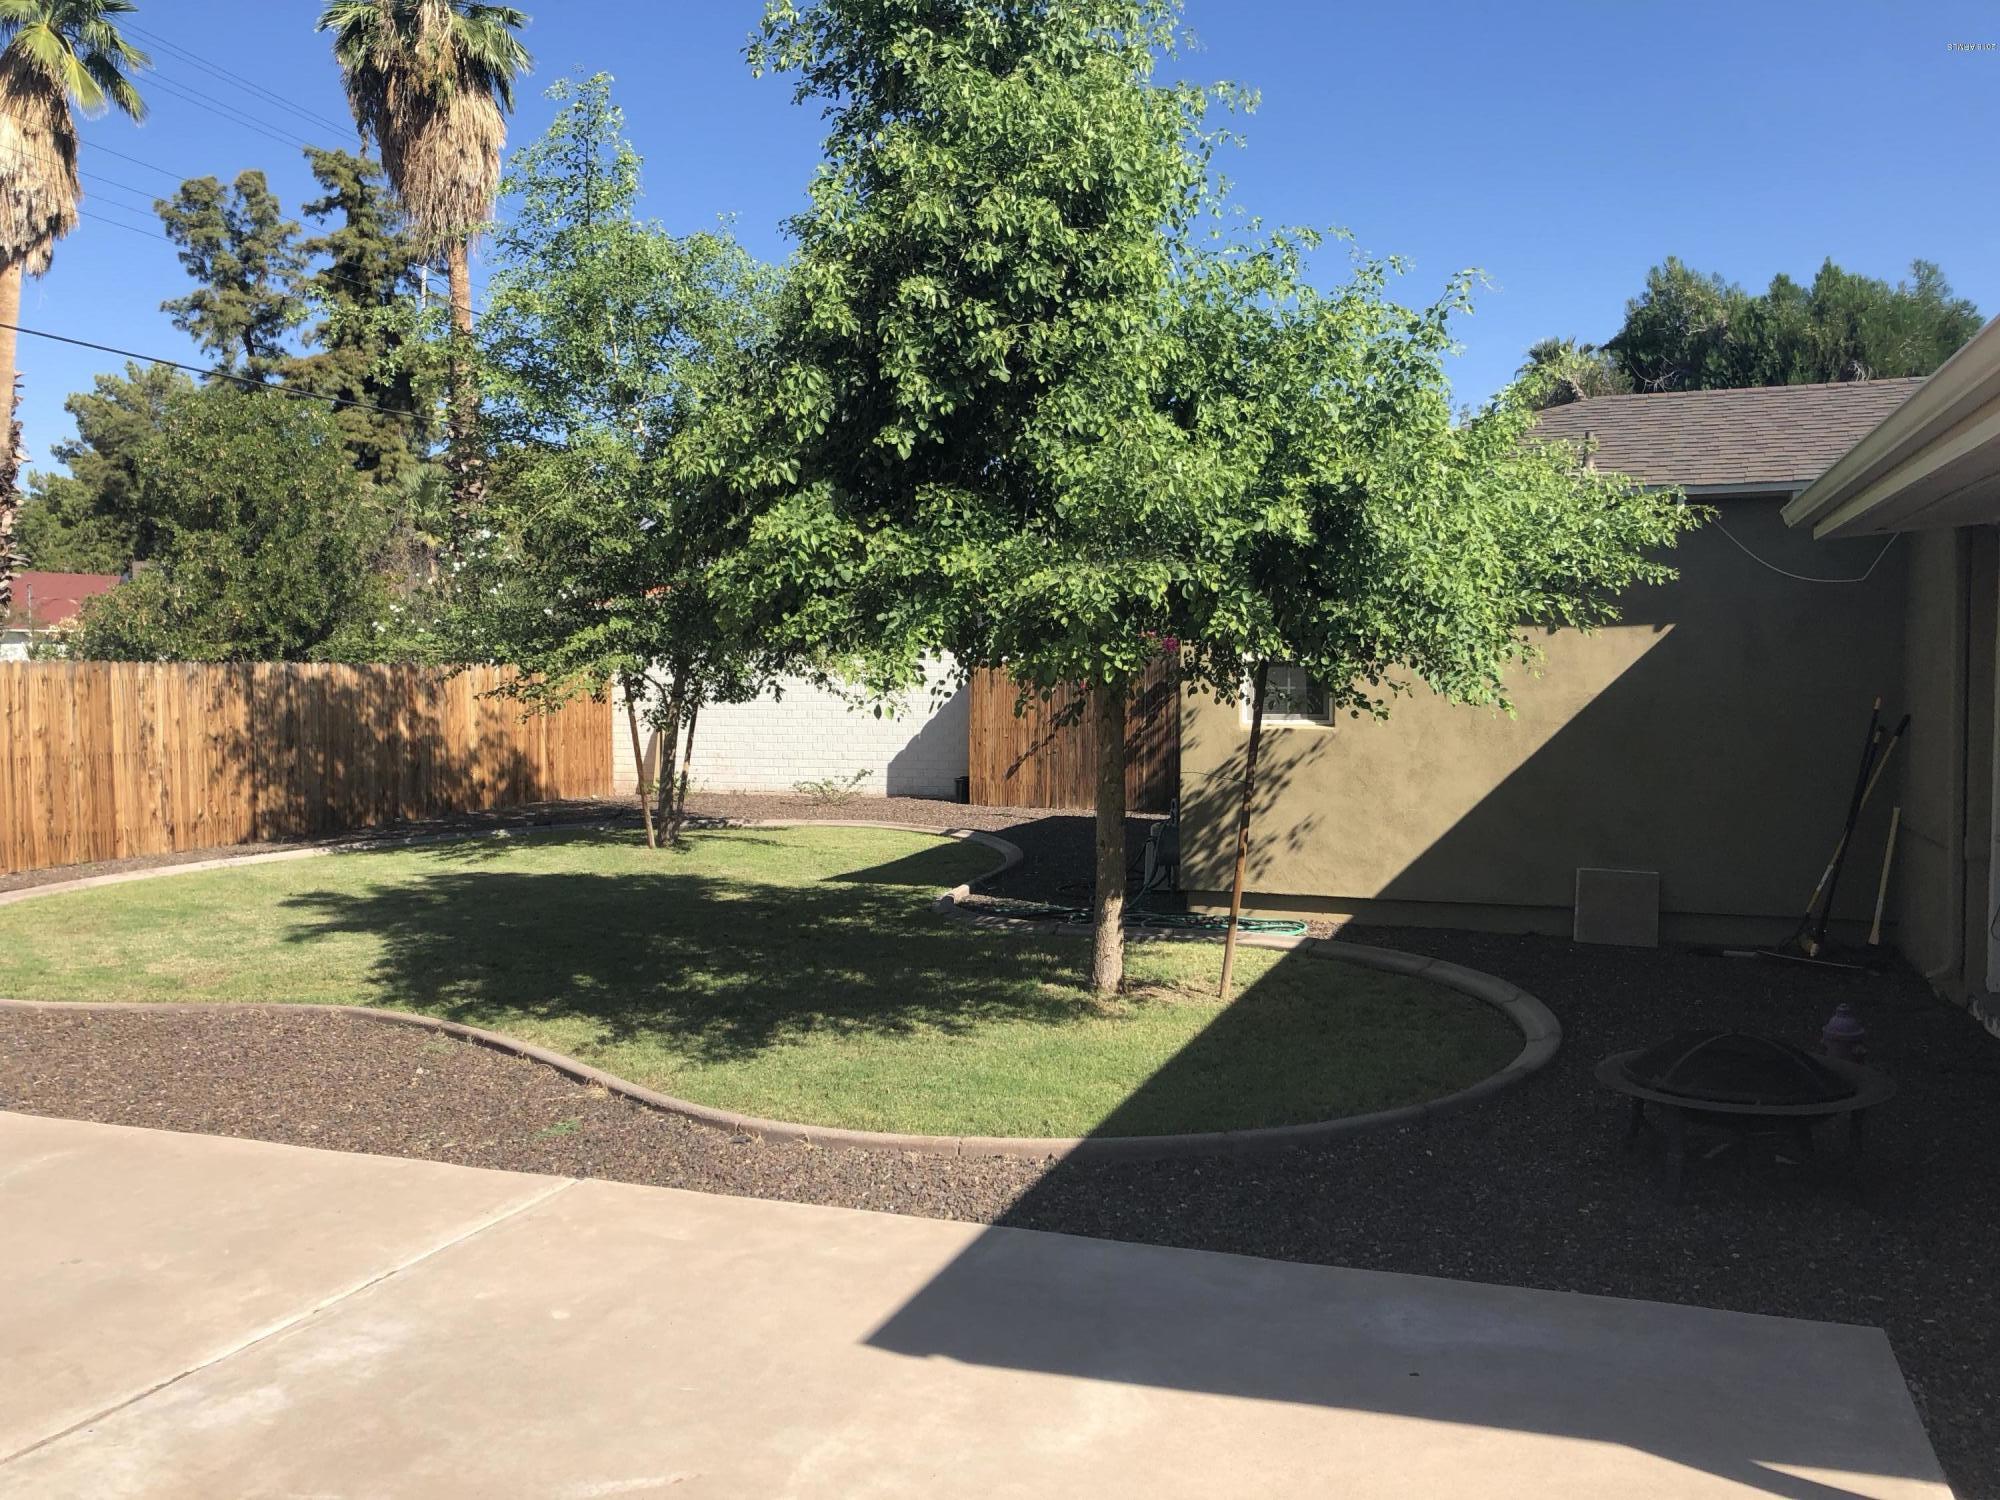 2918 N 17TH Avenue Phoenix, AZ 85015 - MLS #: 5816921